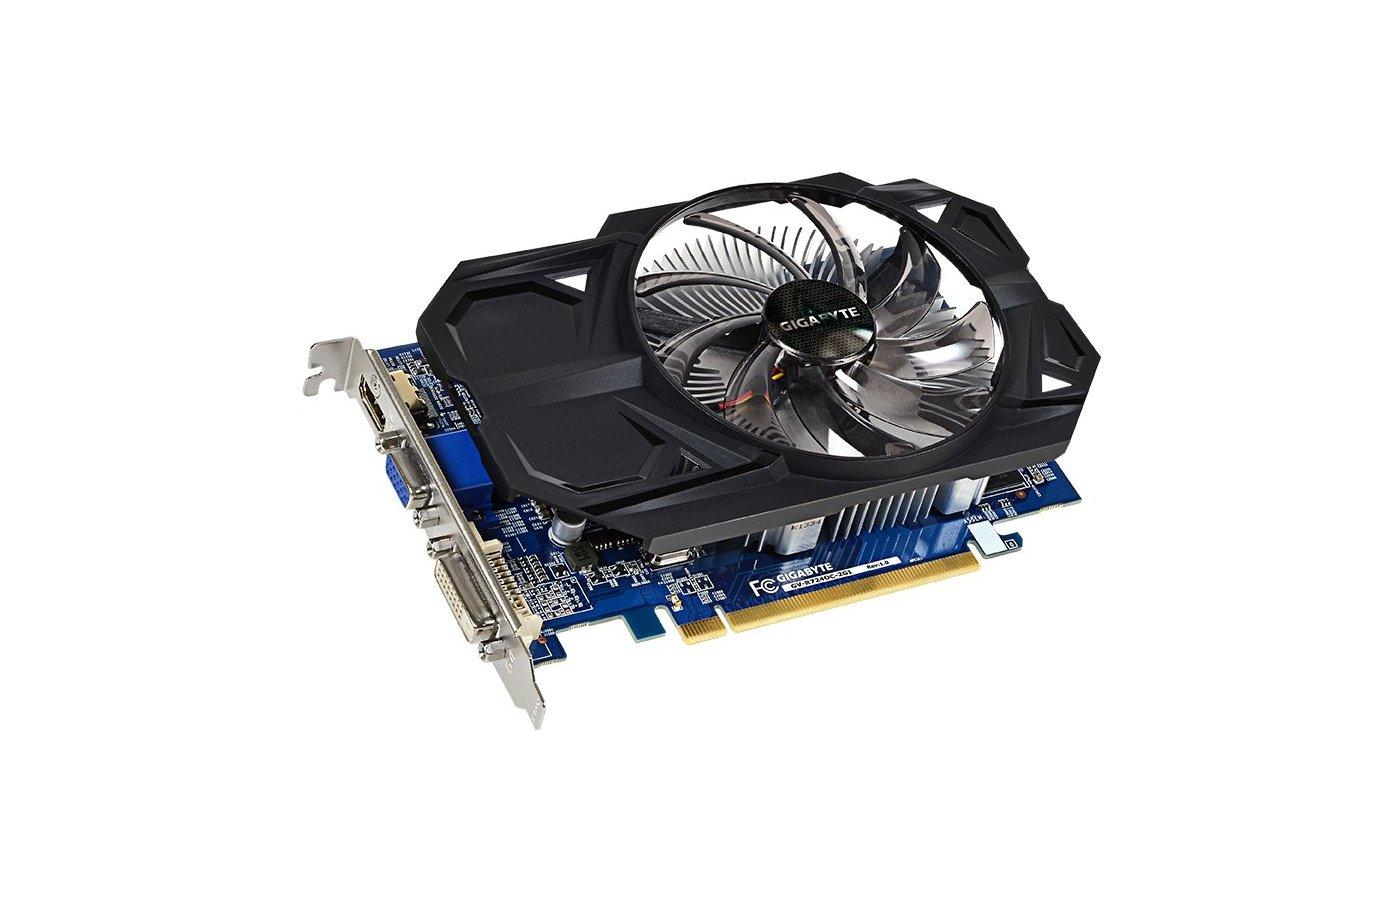 Видеокарта Gigabyte PCI-E GV-R724OC-2GI AMD Radeon R7 240 2048Mb 128bit Ret